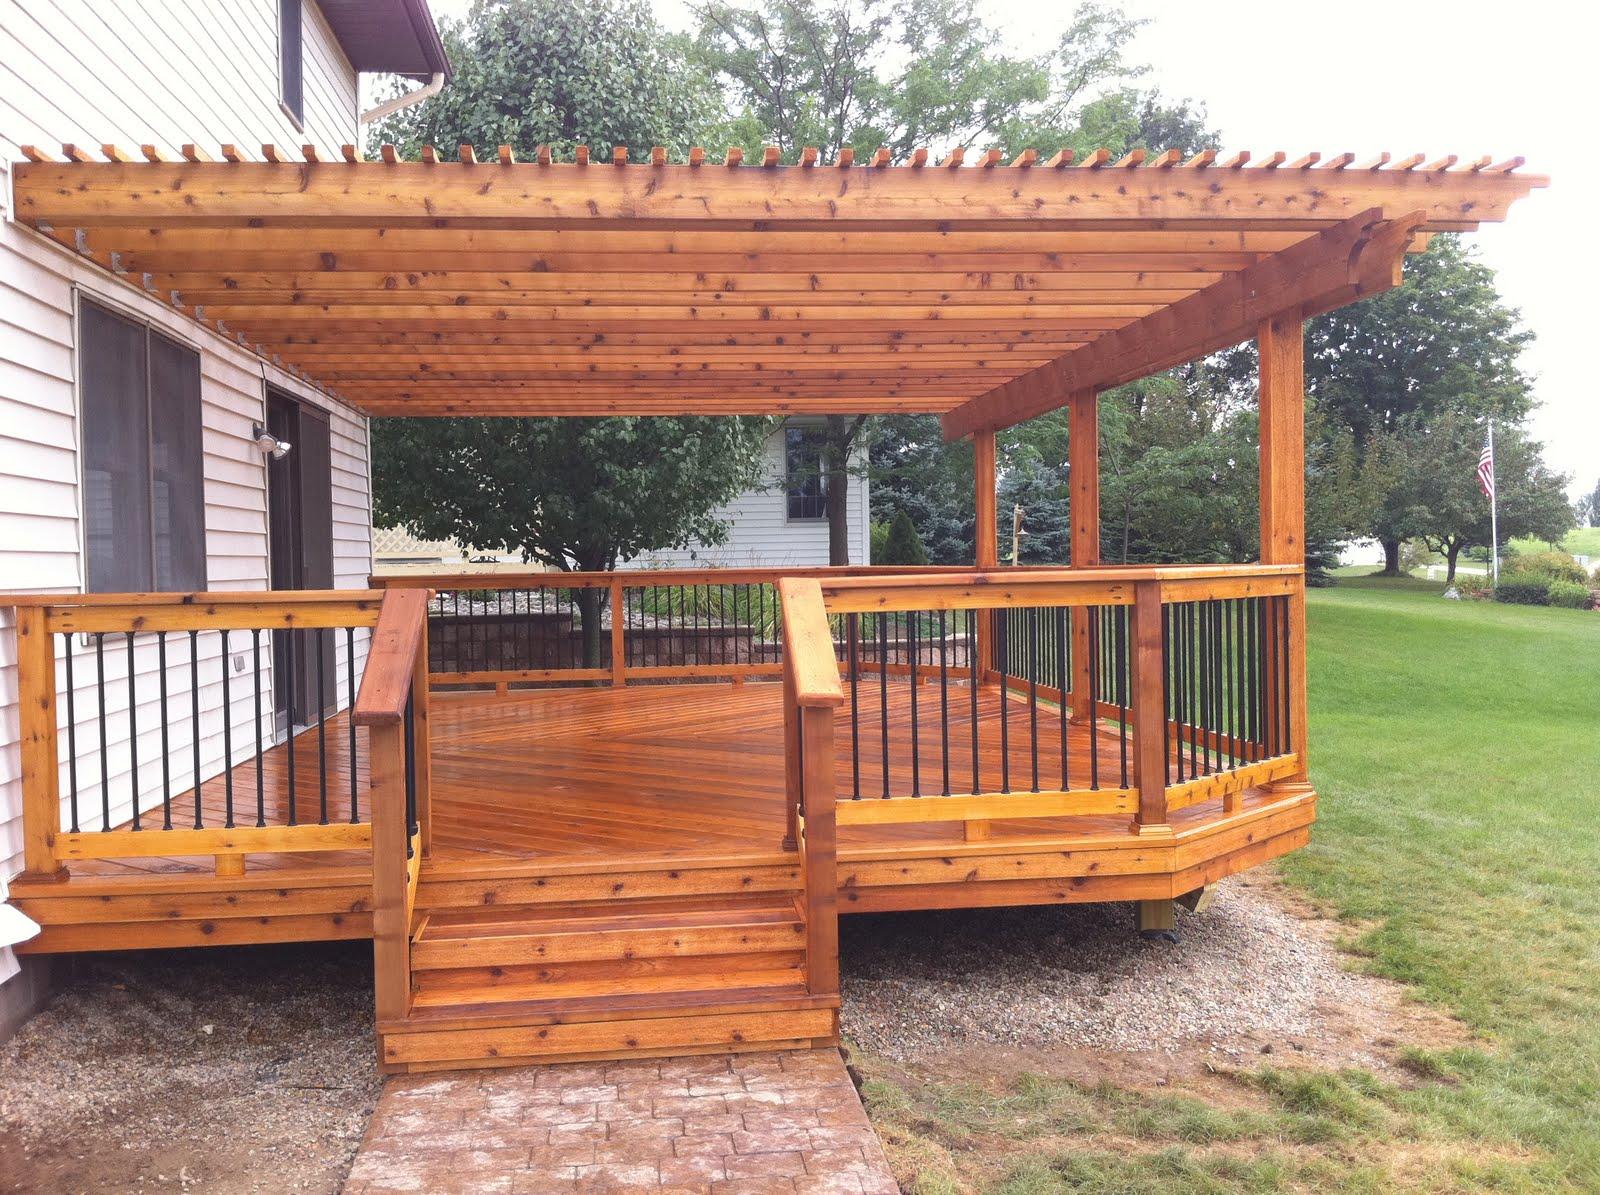 Cedar Wood Decks In Michigan Autumnwoodconstruction39s Blog